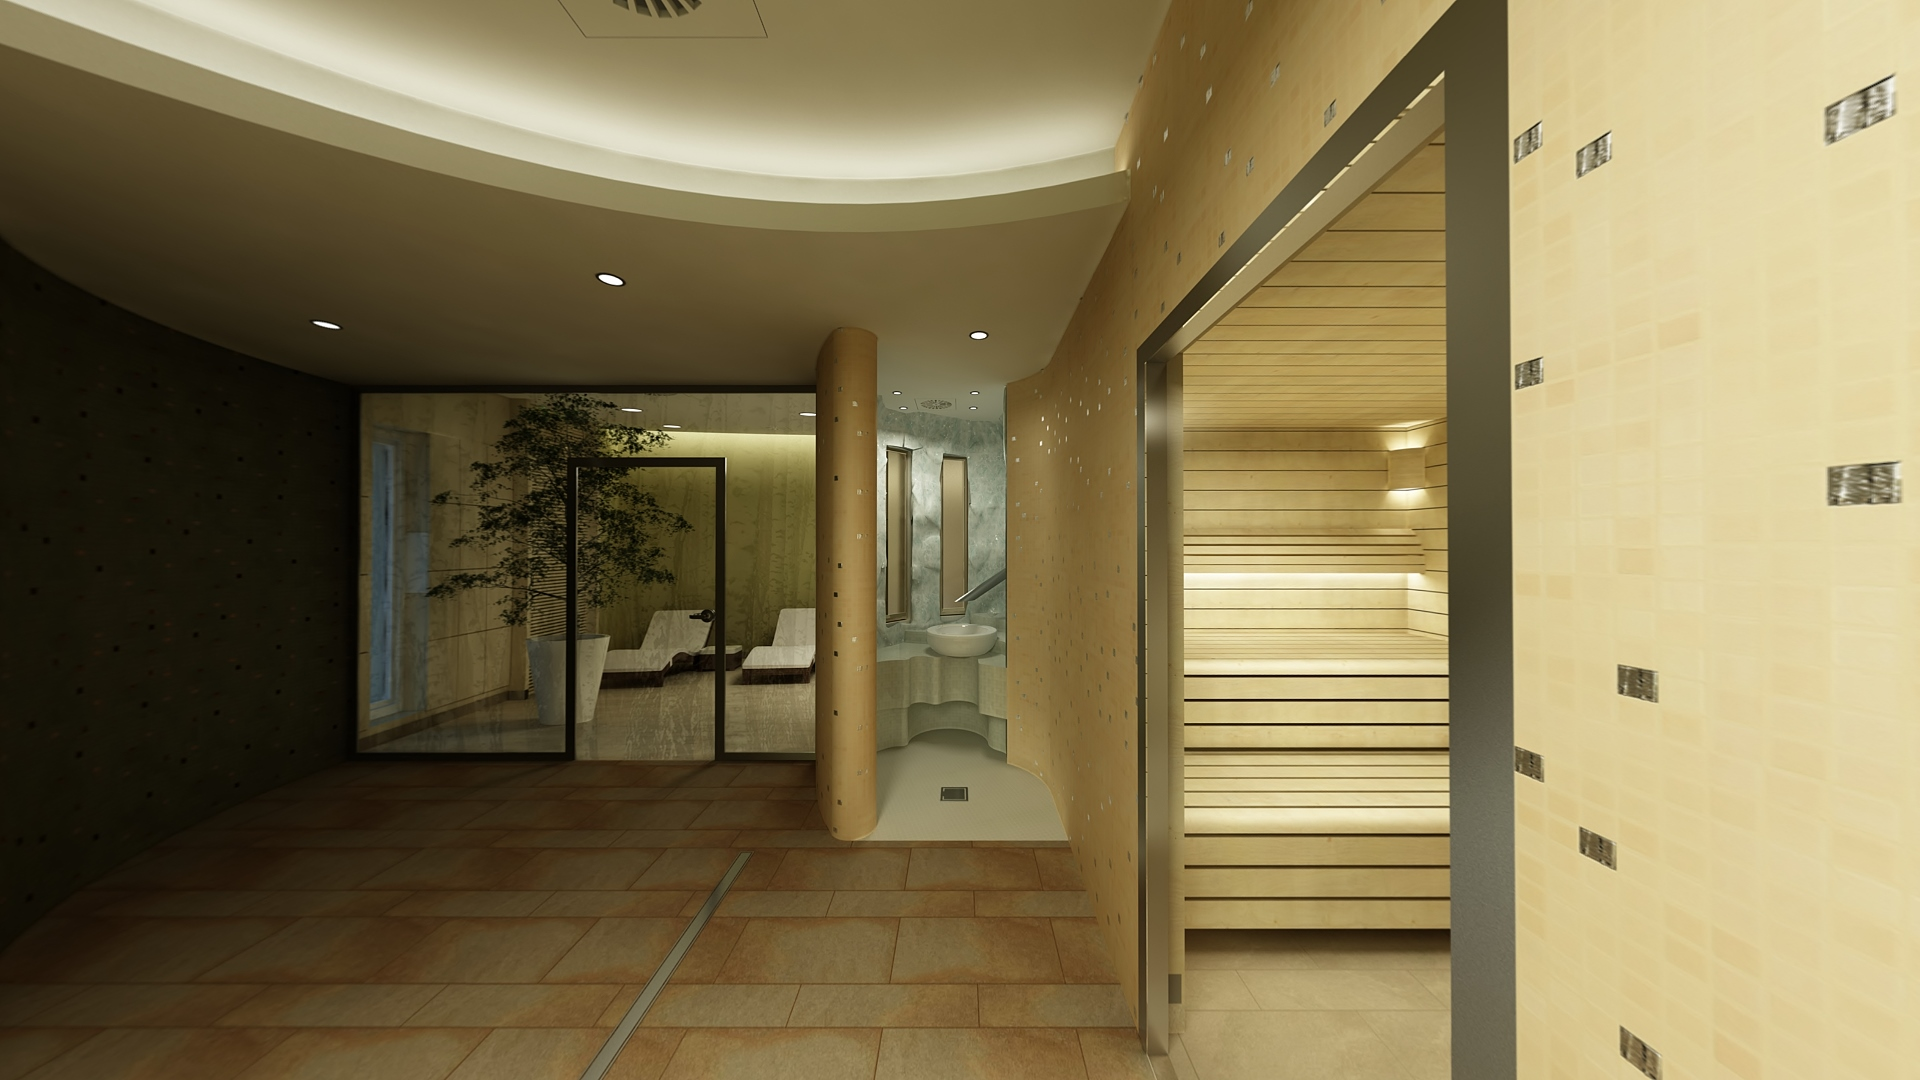 strefa mokra SPA-widok na grotę i saunę